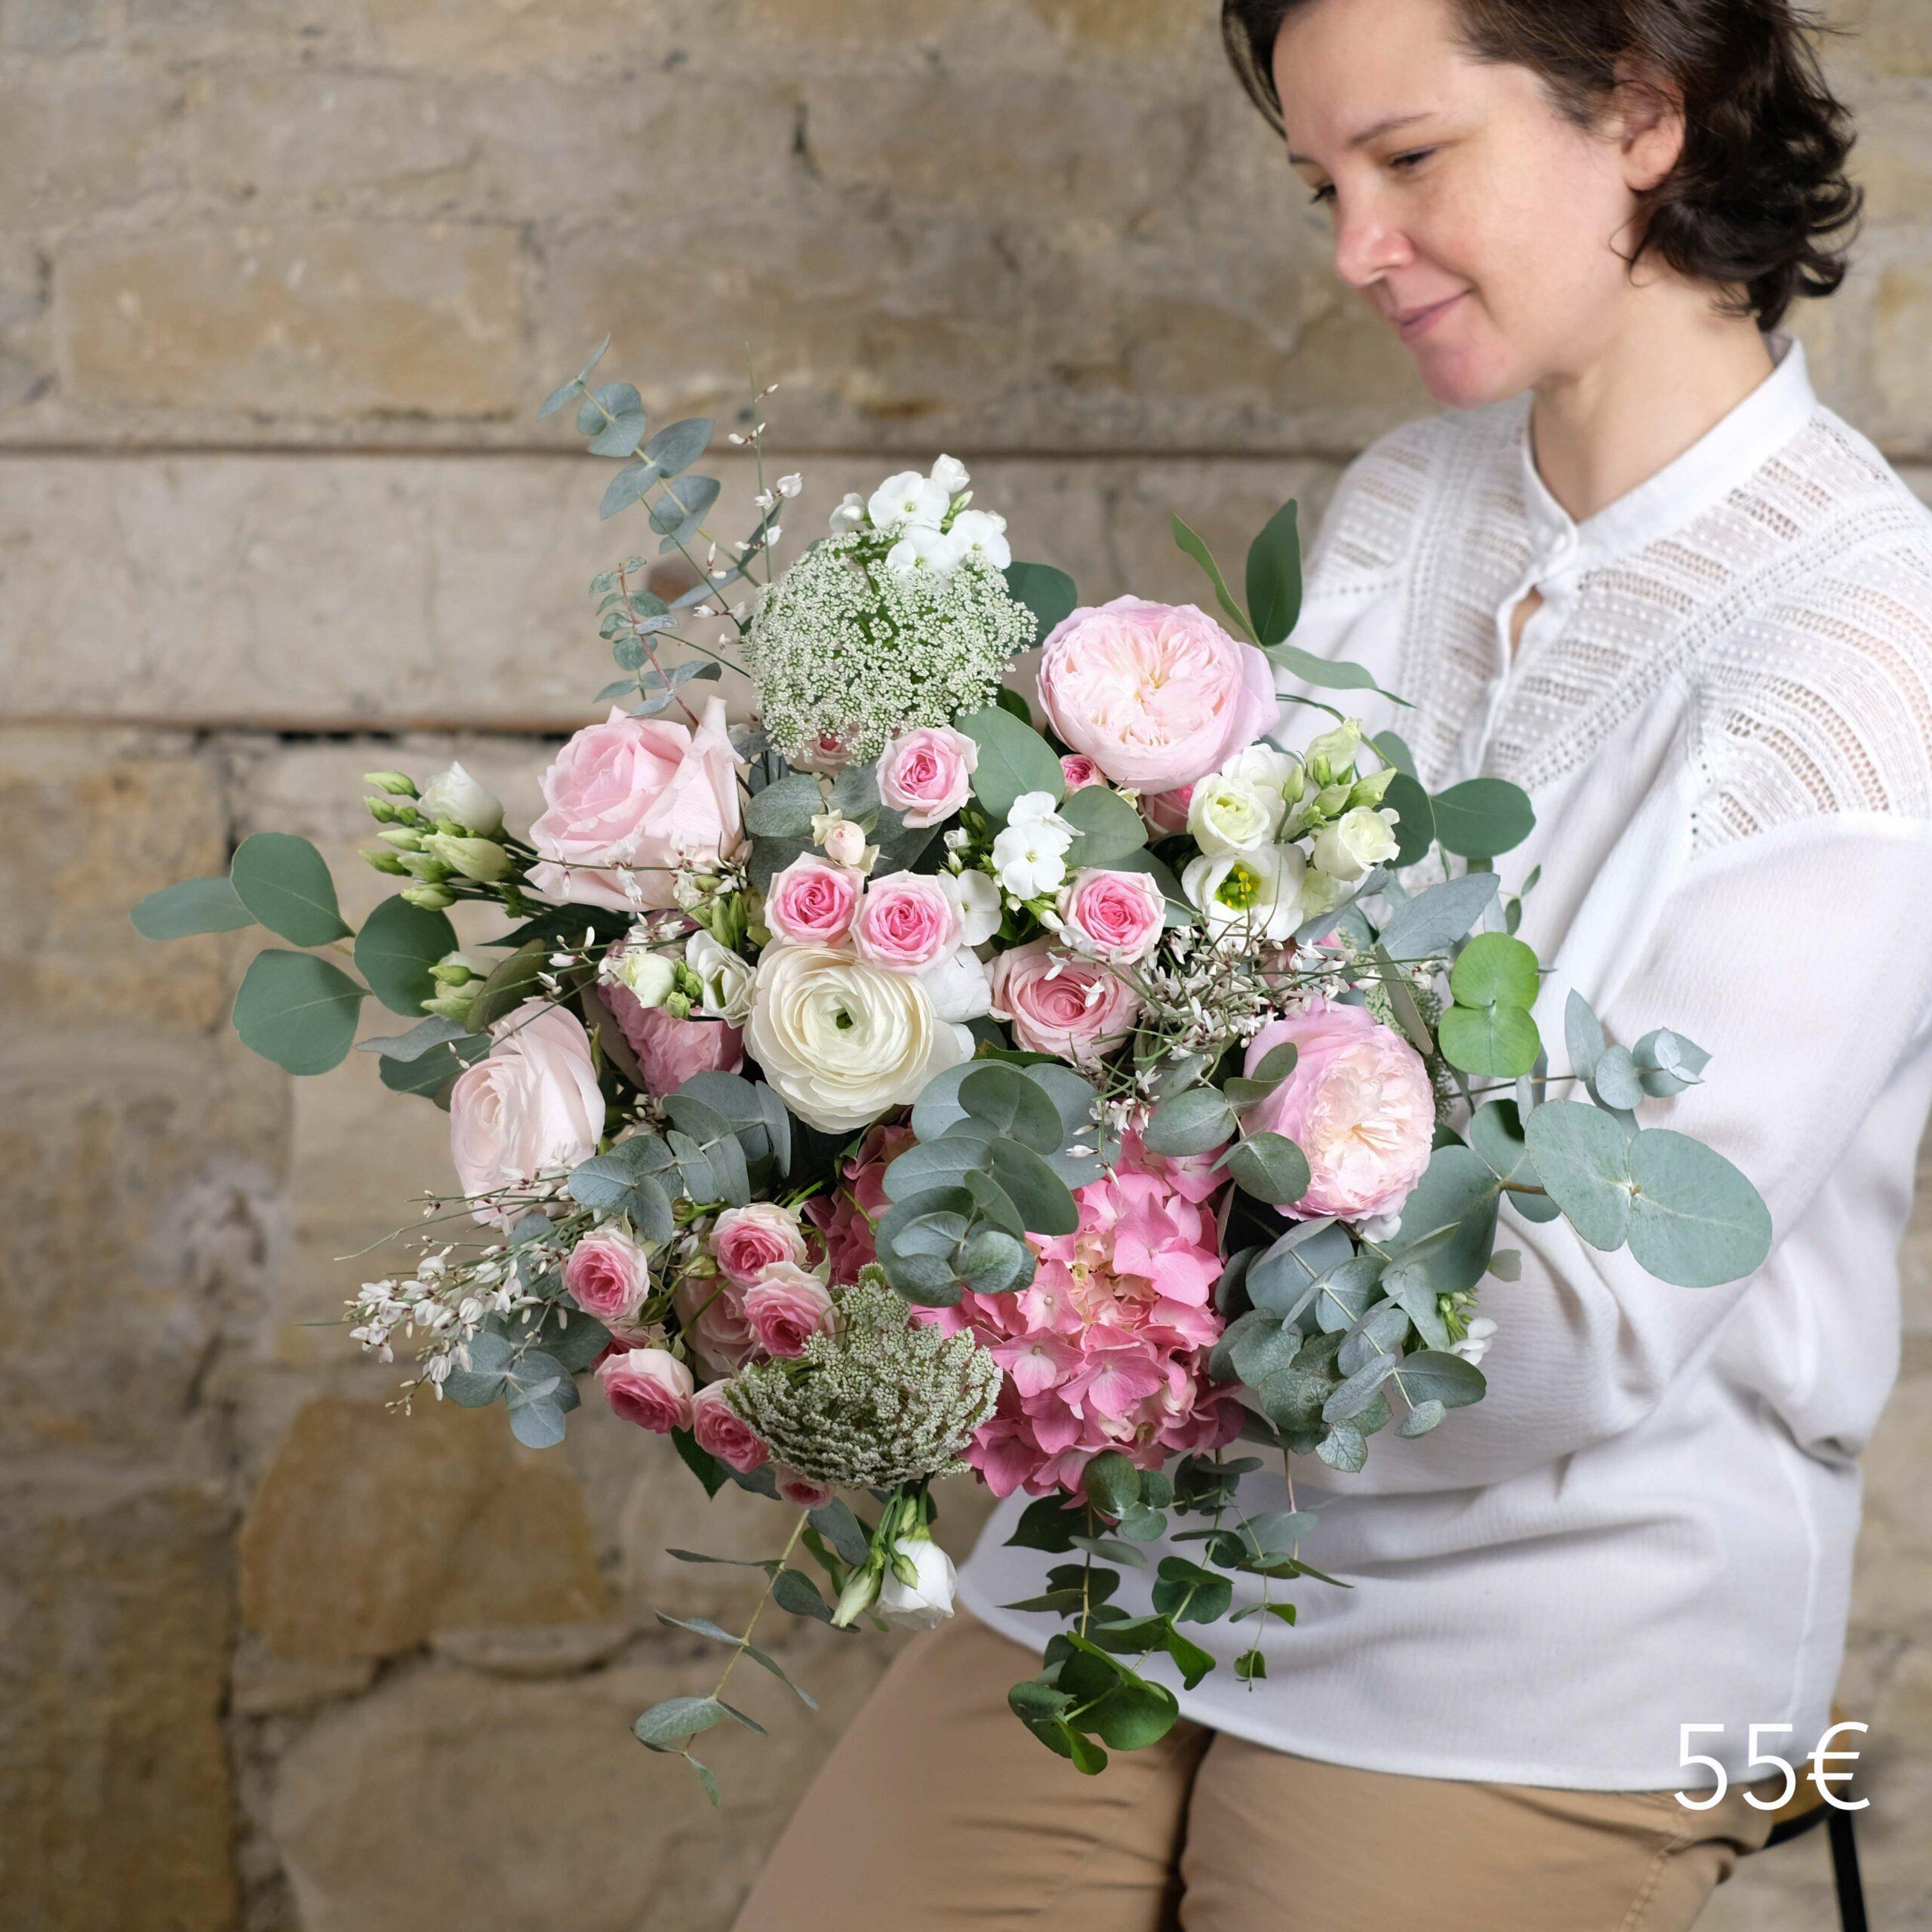 2_bouquet-fleurs-tendresse-55